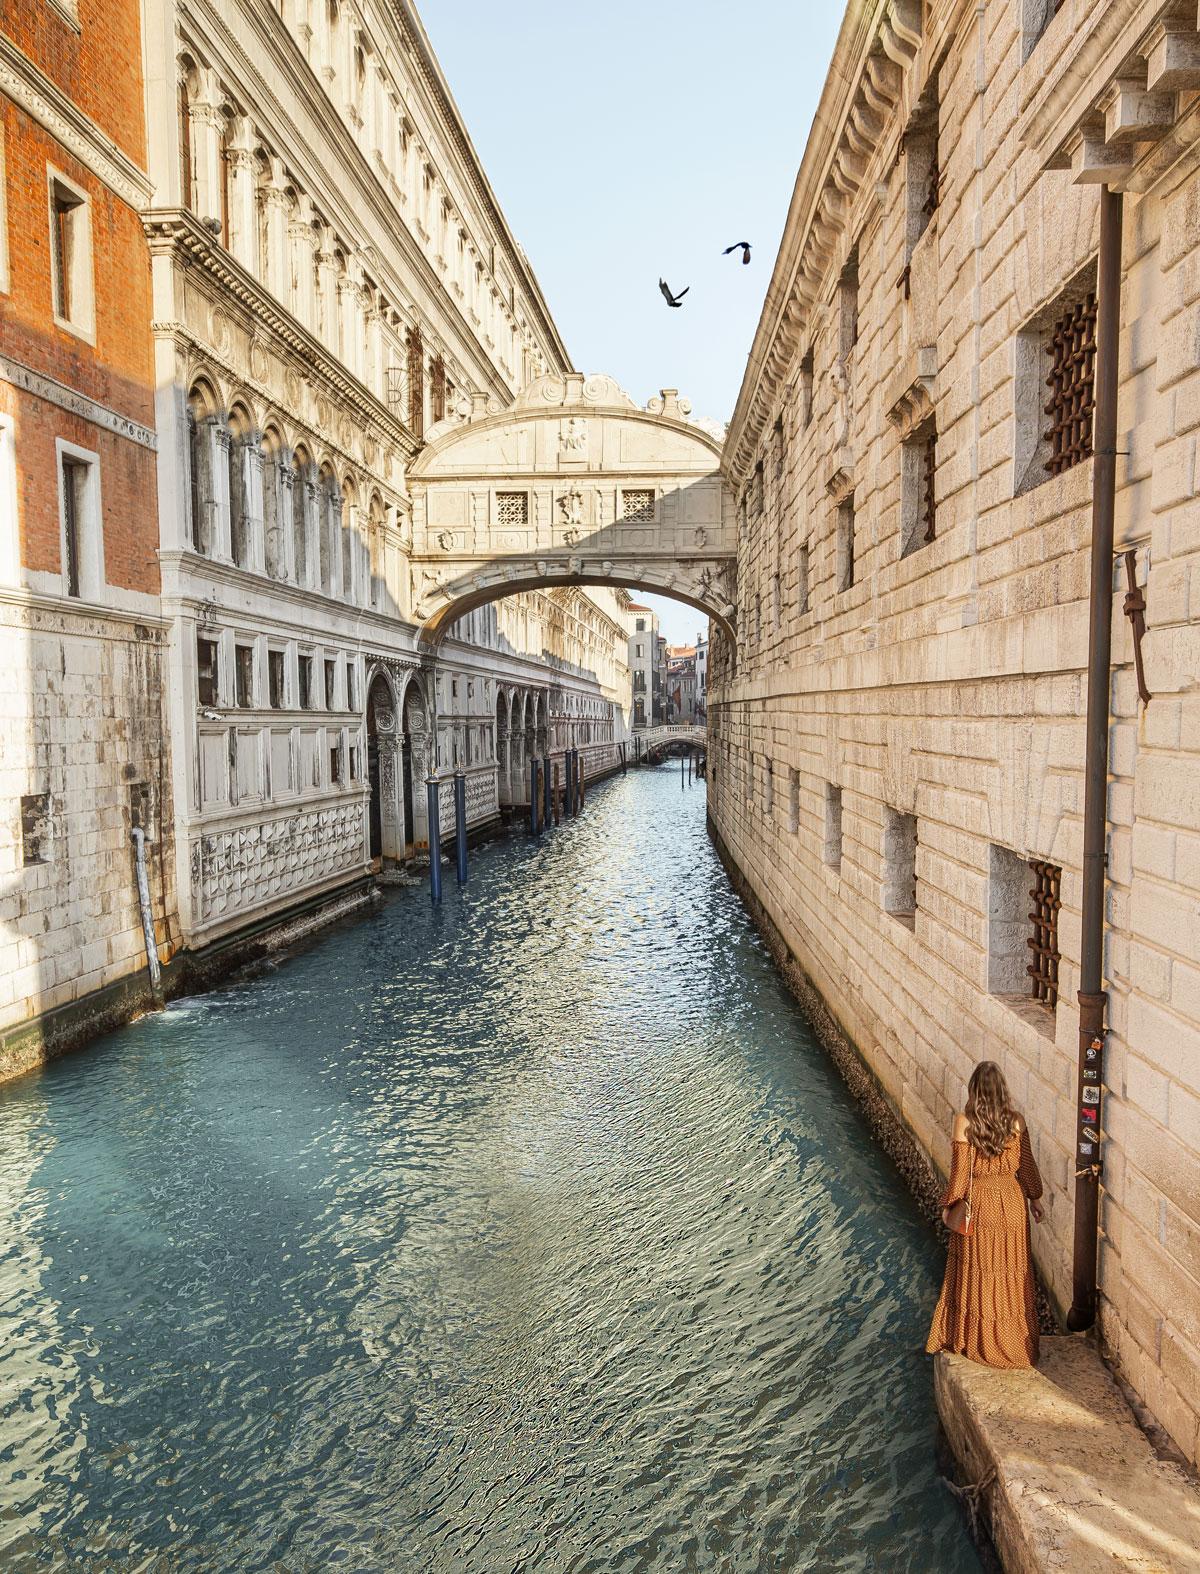 25-top-things-to-do-in-Venice---Venice-Instagram-spots-–-Venice-bucket-list---kelseyinlondon---kelsey-heinrichs---venice-gondola-ride---venice-grand-canal